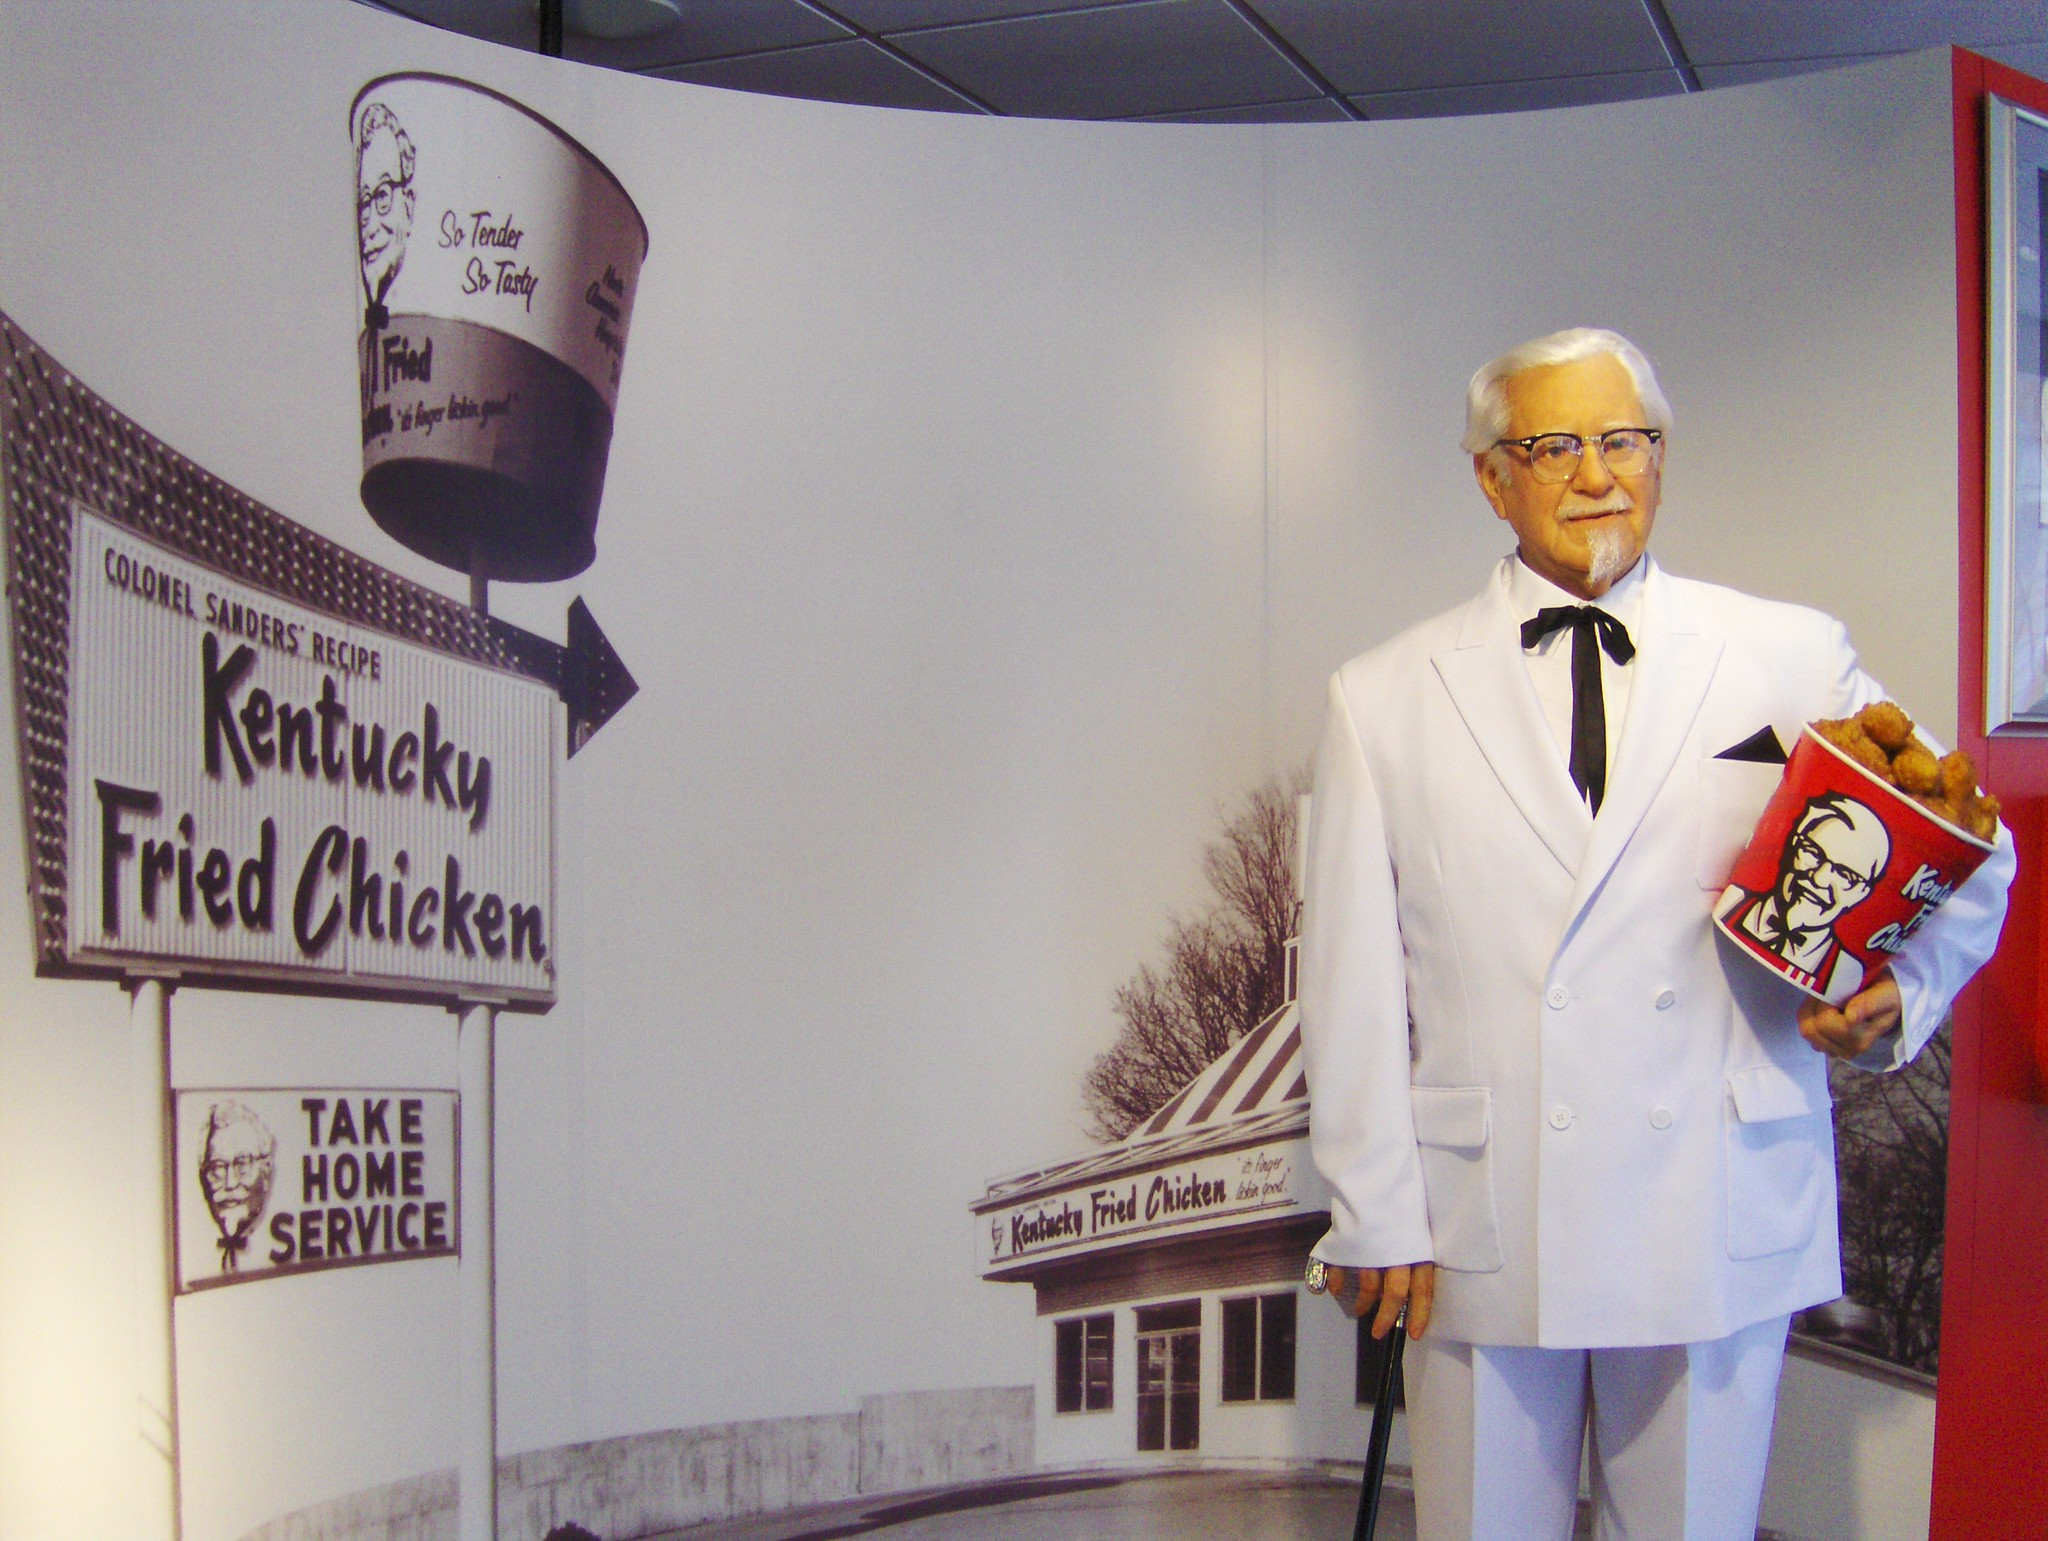 statue of KFC Col. Sanders in front of original KFC location poster